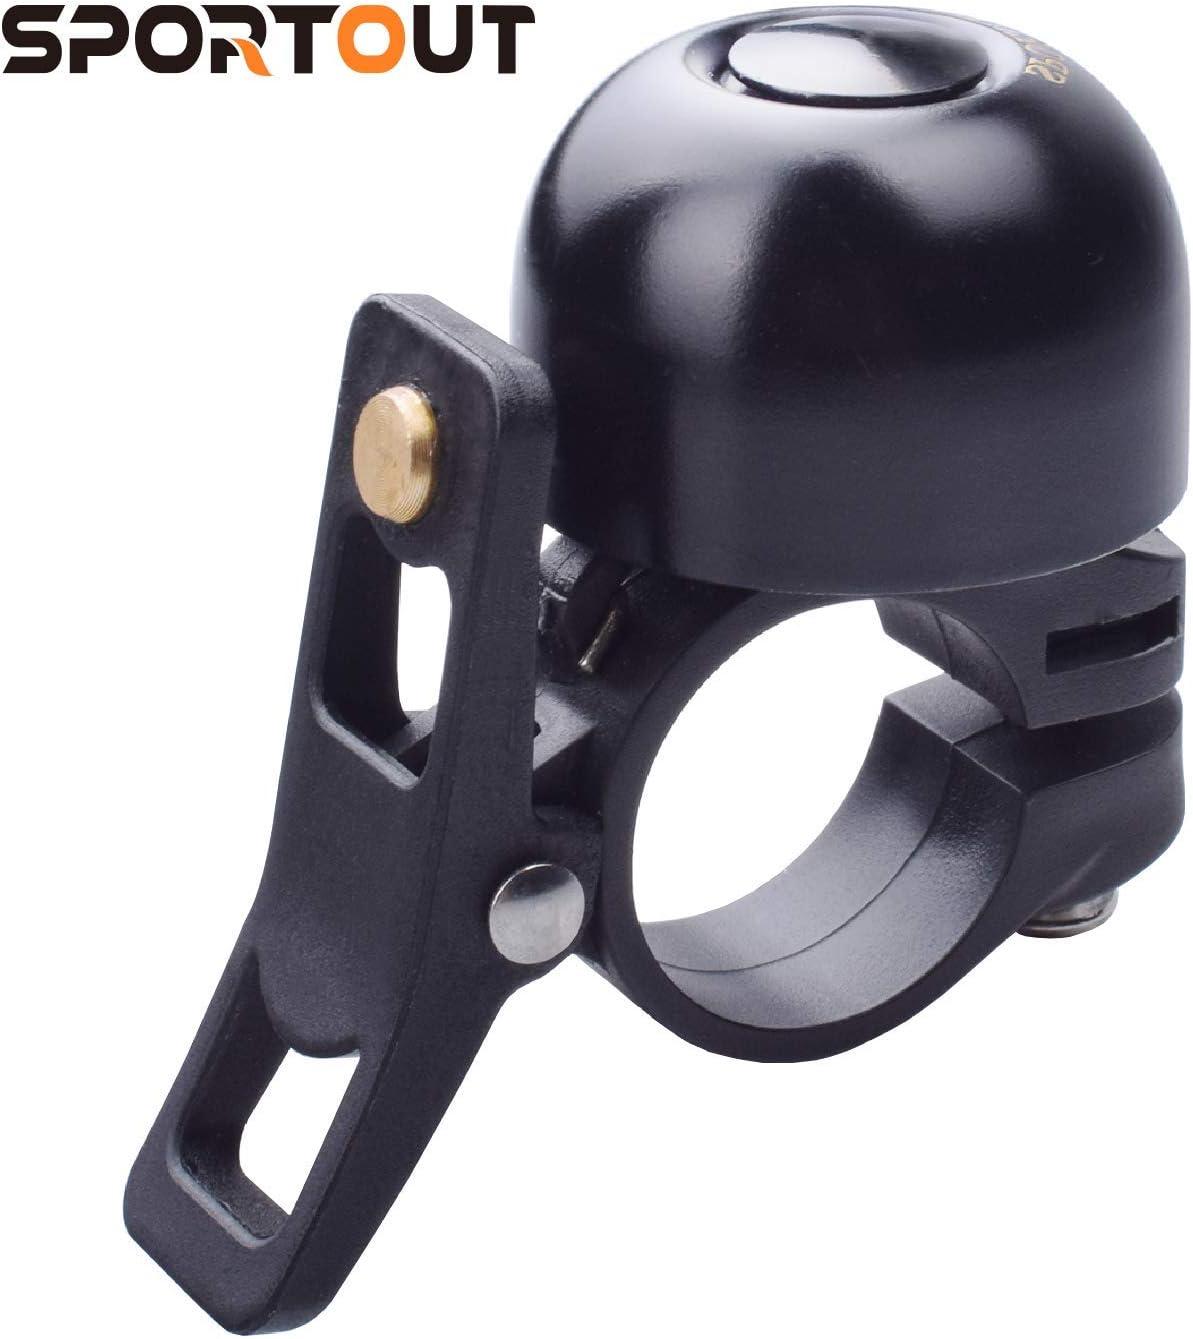 Sportout Ultra-Cheap Deals Copper Alloy Bike Bell Loud Bicycle Classic List price Soun